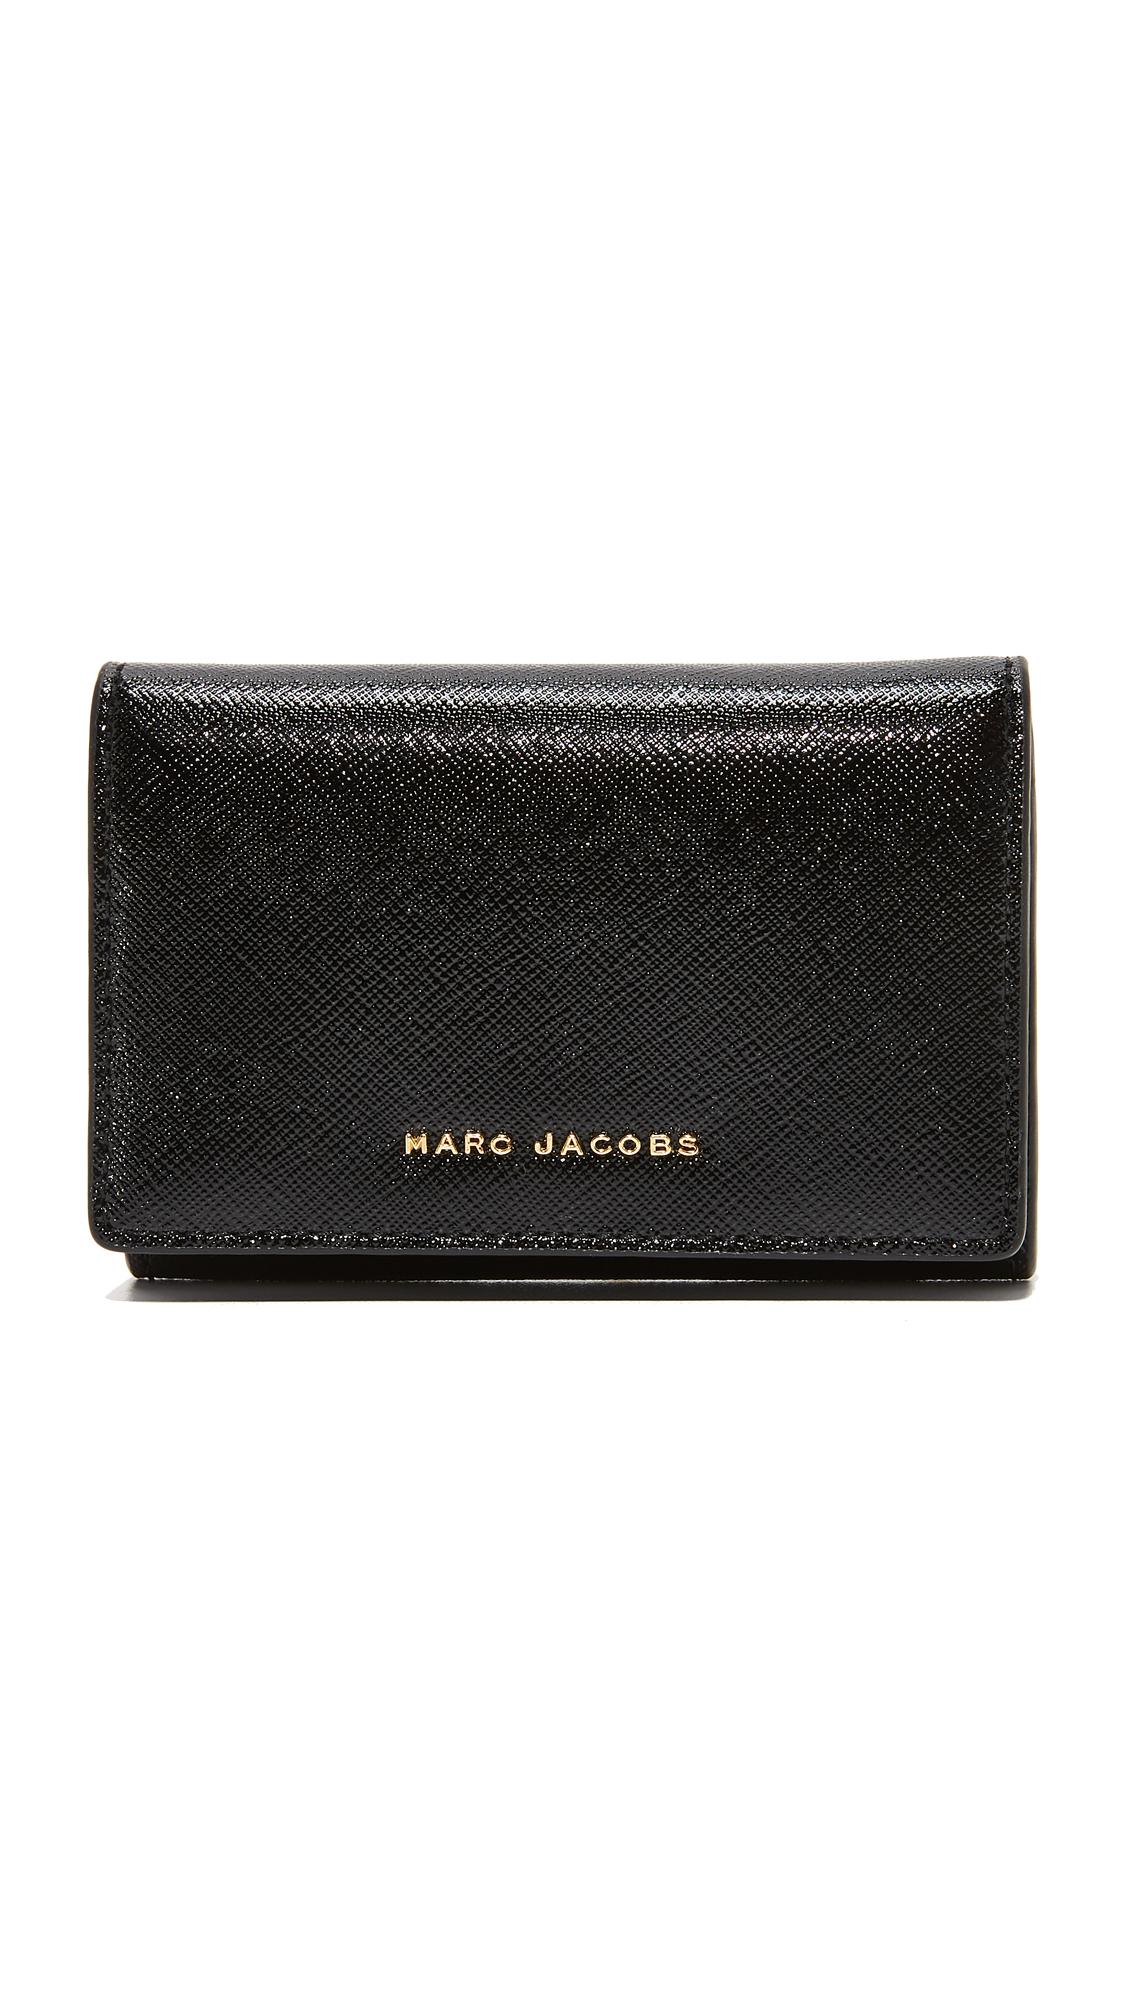 Marc Jacobs Multi Wallet - Black/Berry